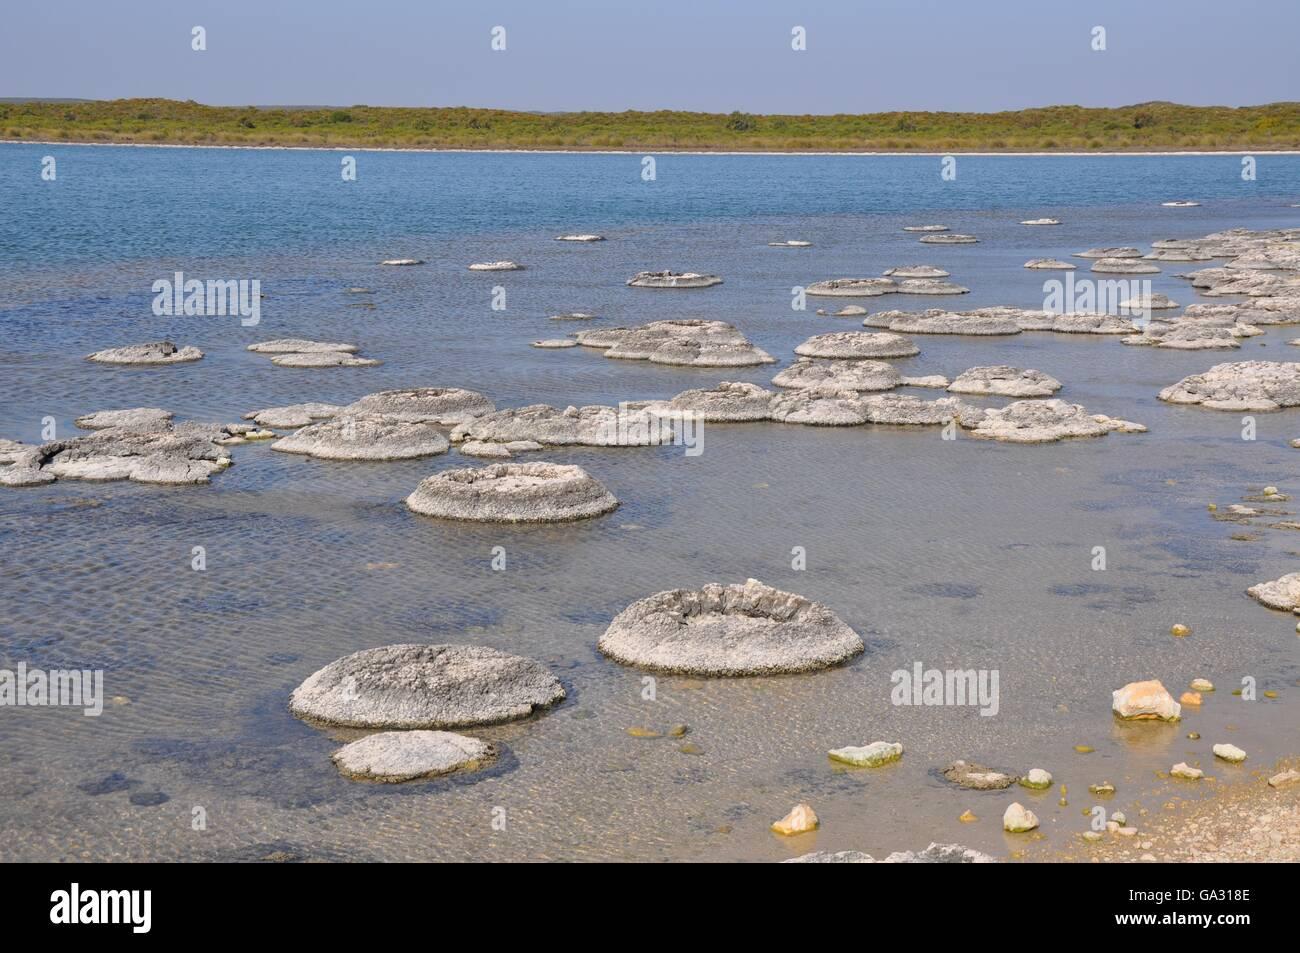 Marine Fossils Stock Photos & Marine Fossils Stock Images ...